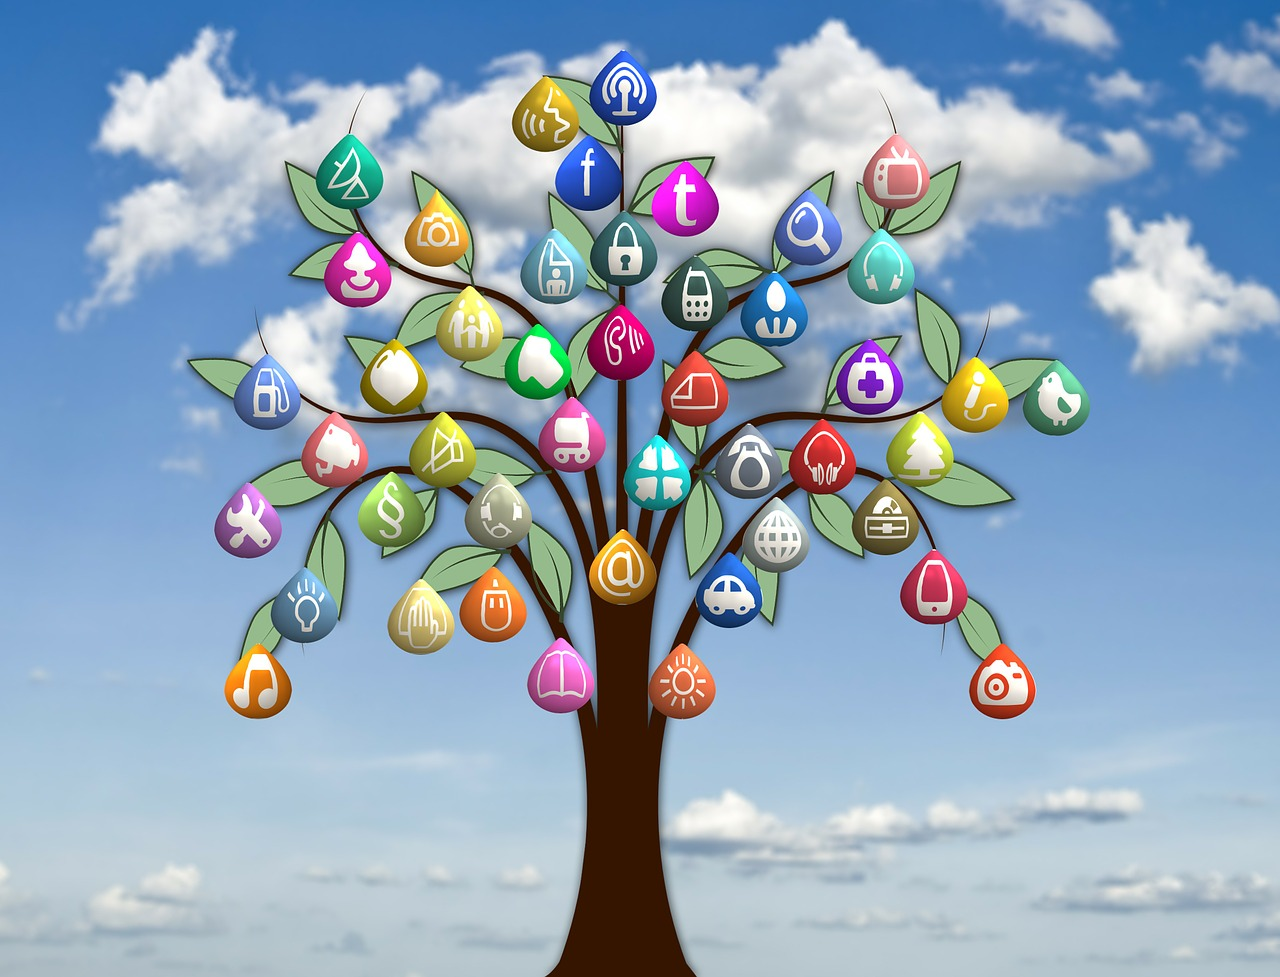 tree-240470_1280